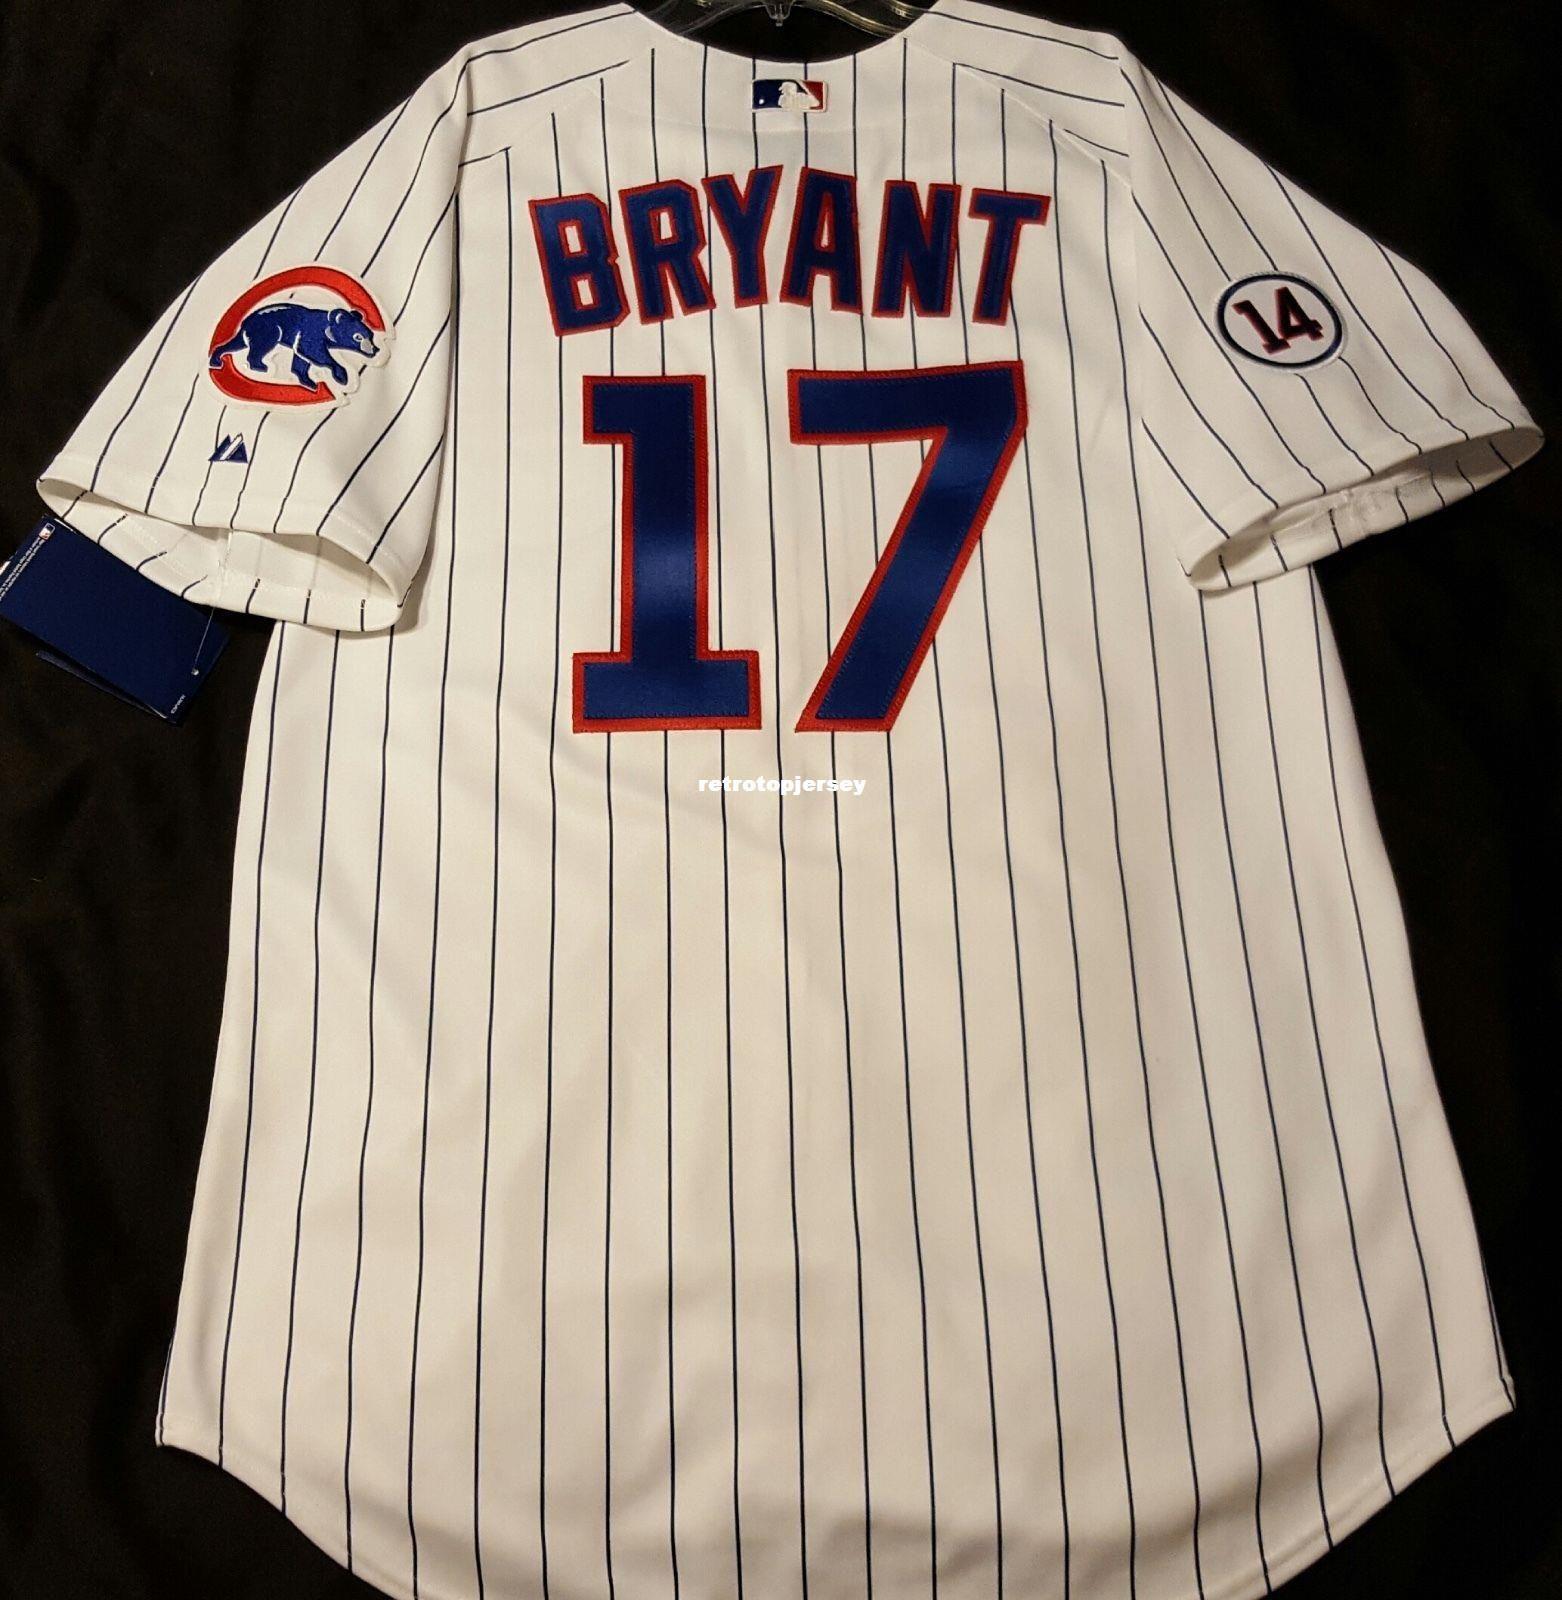 Barato! CHICAGO majestoso # 17 PINSTRIPE, BRYANT NO CAMPO Jersey Mens Costurado Atacado Grande E Alto TAMANHO XS-6XL camisas de basebol